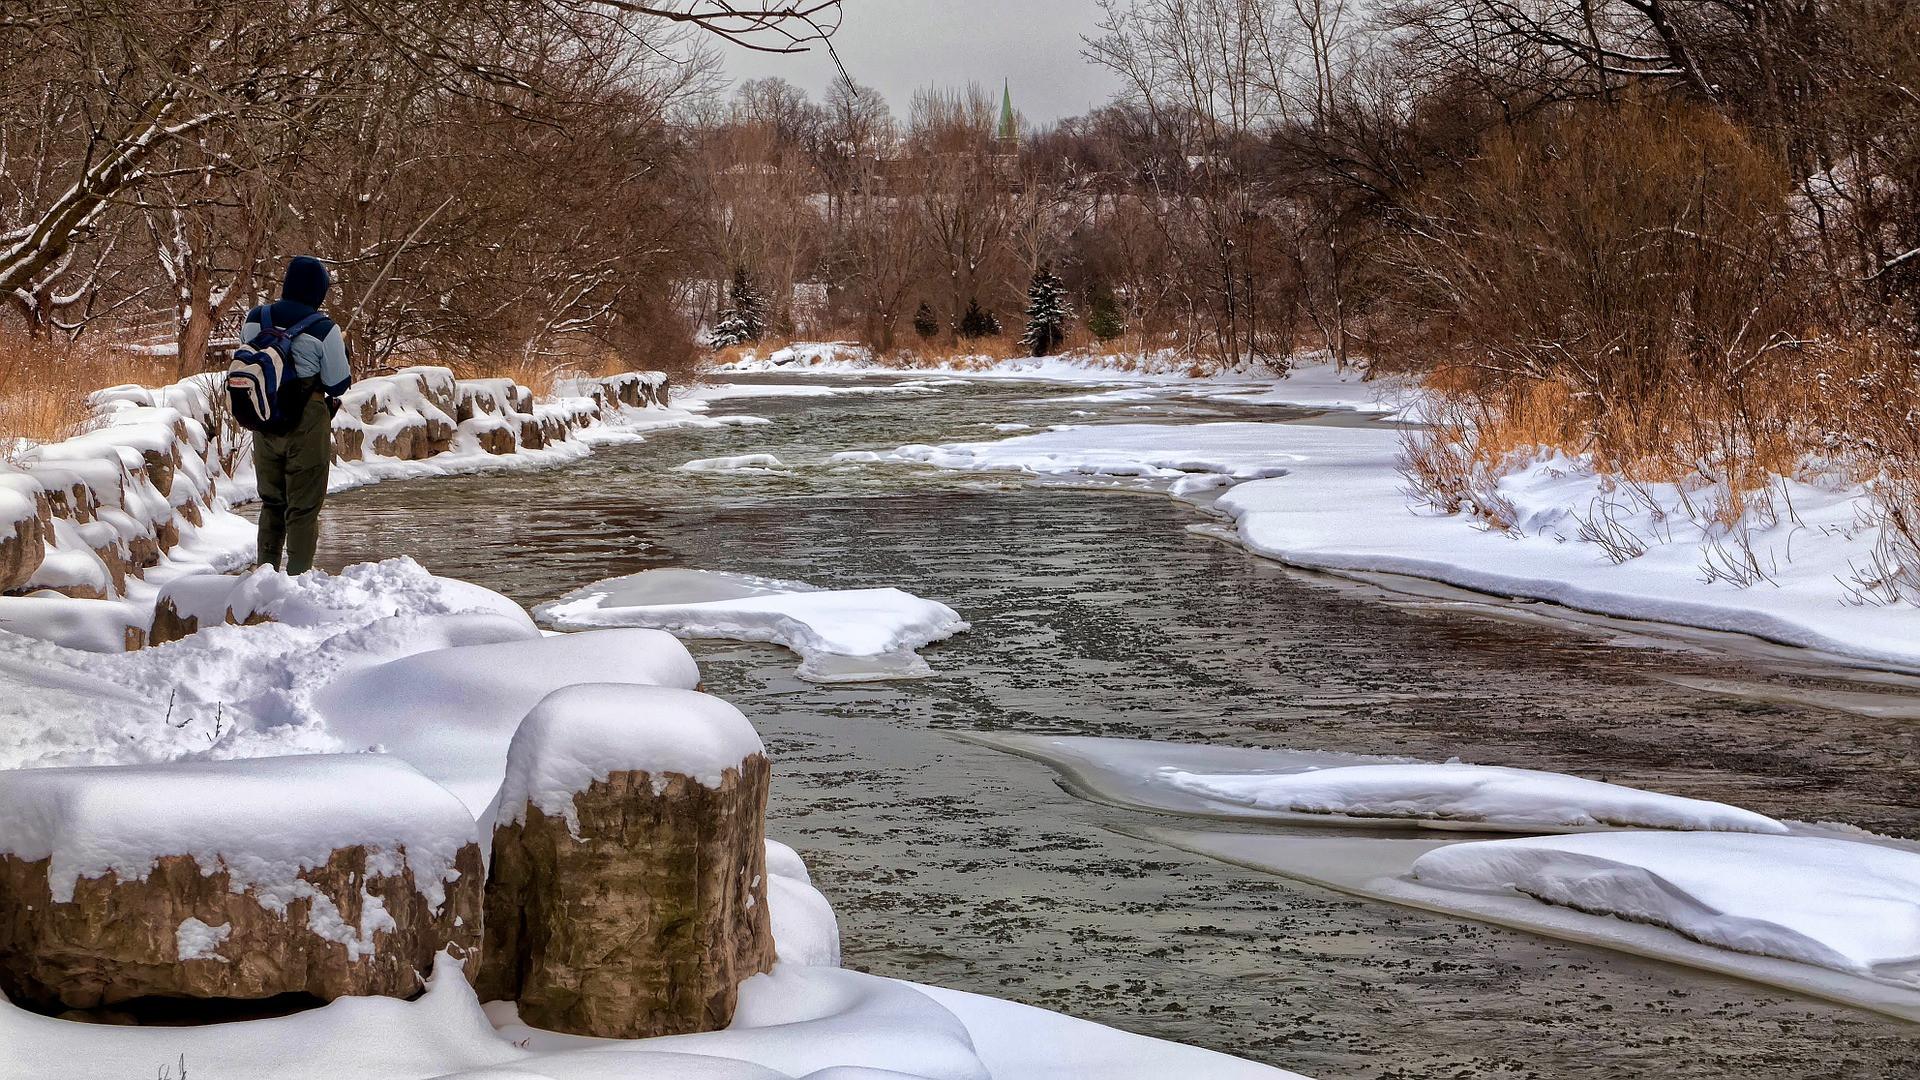 winter-fishing-954075_1920.jpg